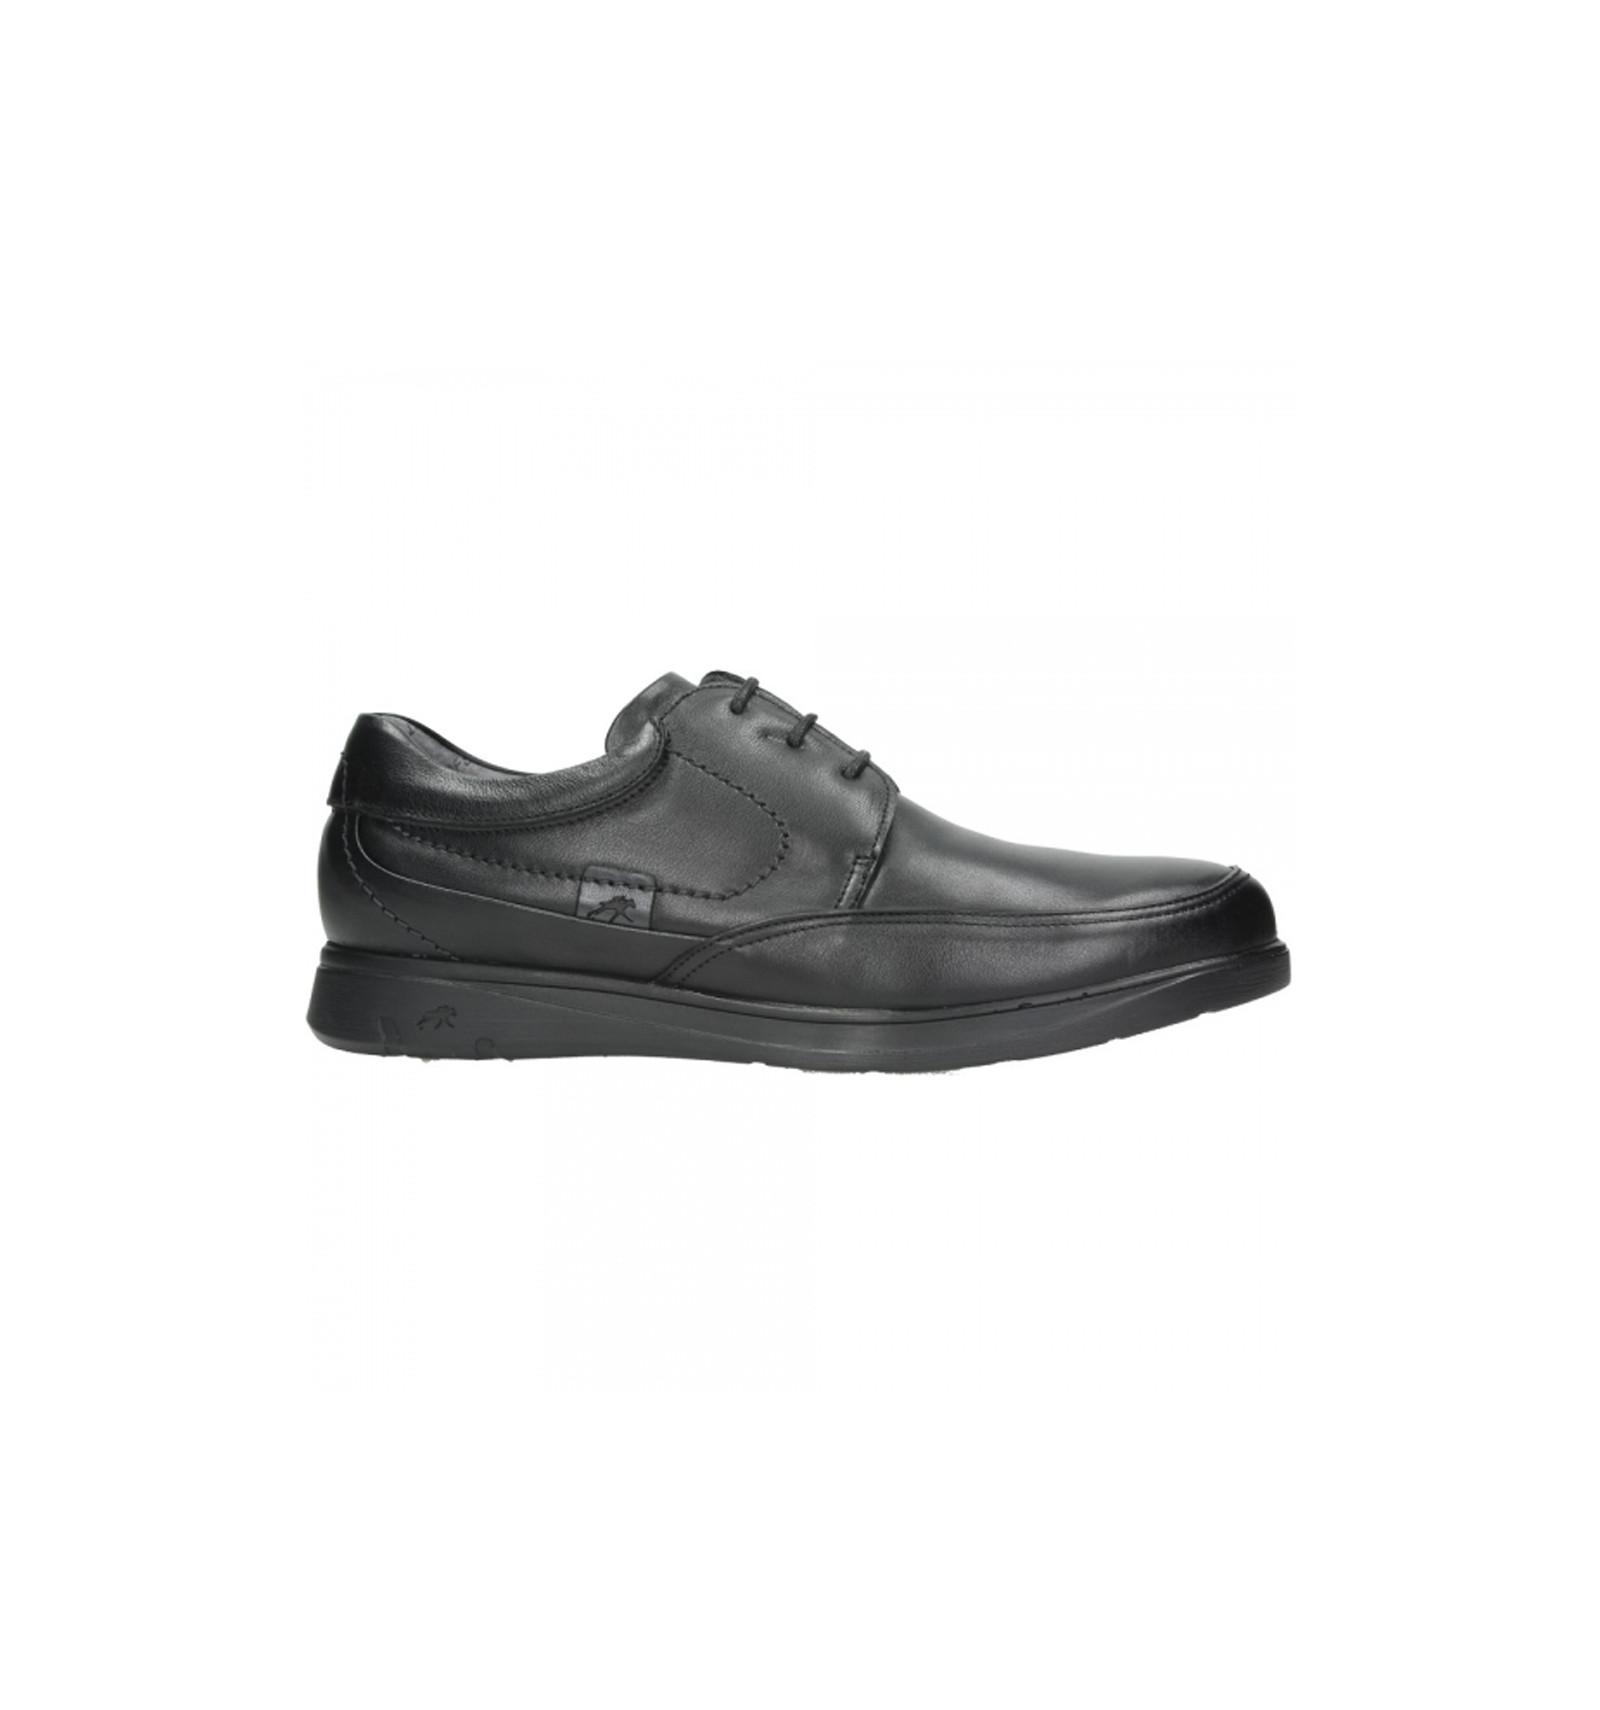 Camarero Fluchos Zapato Hombre Cordones Profesional vb76gYfy